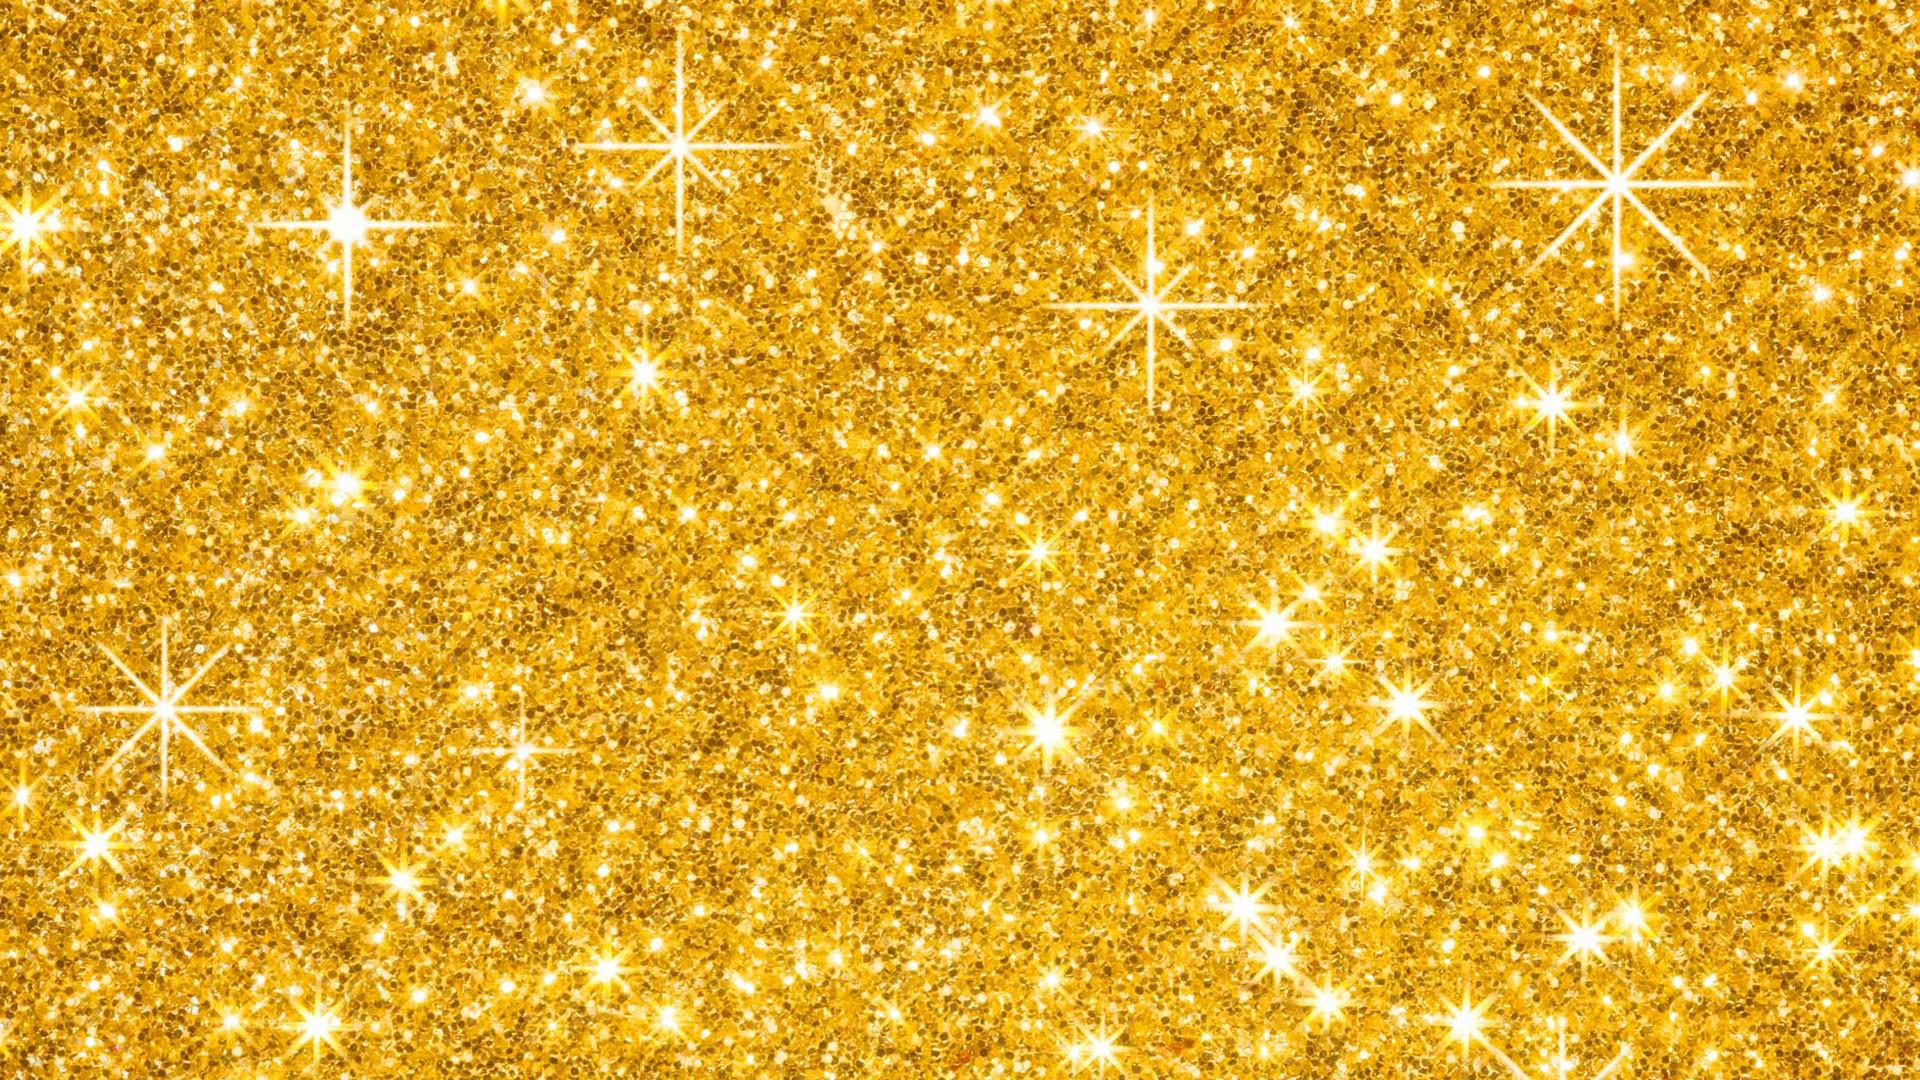 Gold glitter background wallpaper 58 images - Wandfarbe gold glitter ...